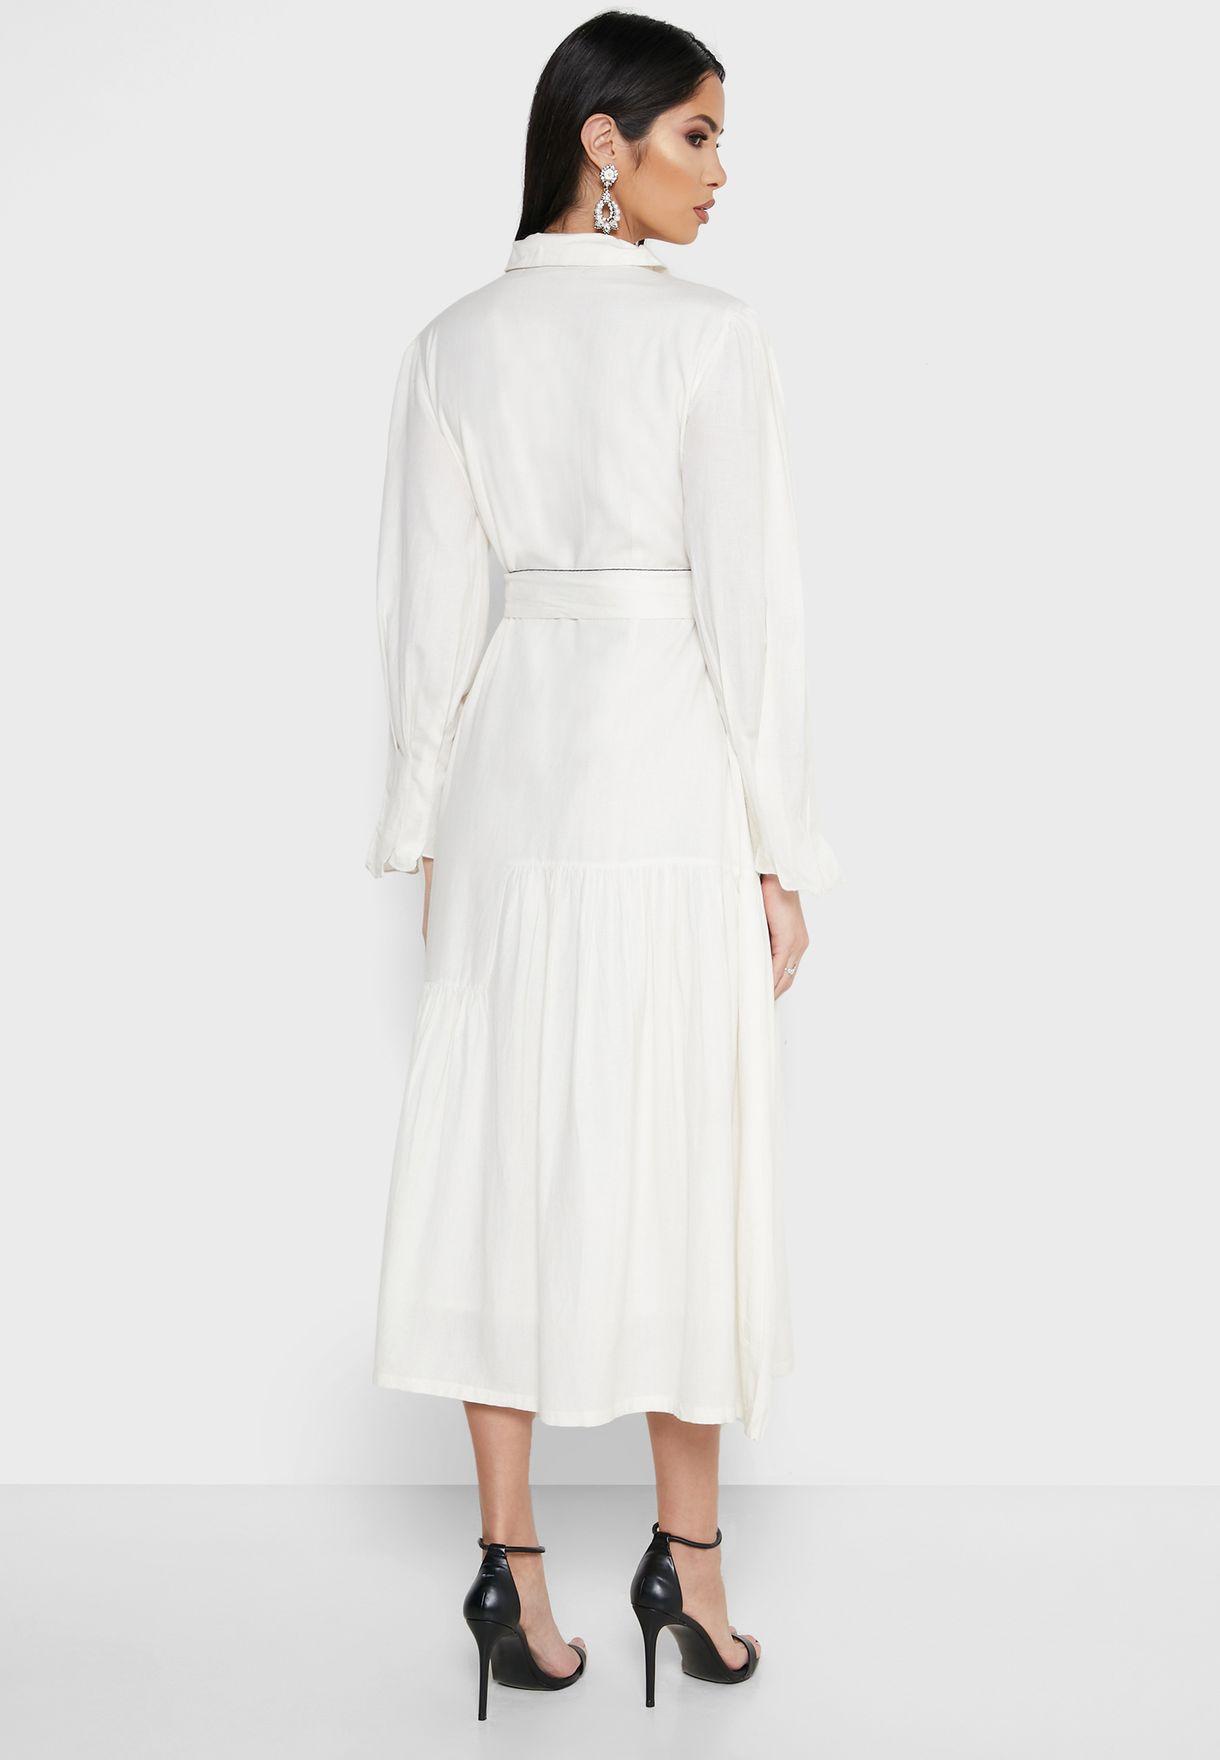 Embroidered Tie Waist Shirt Dress